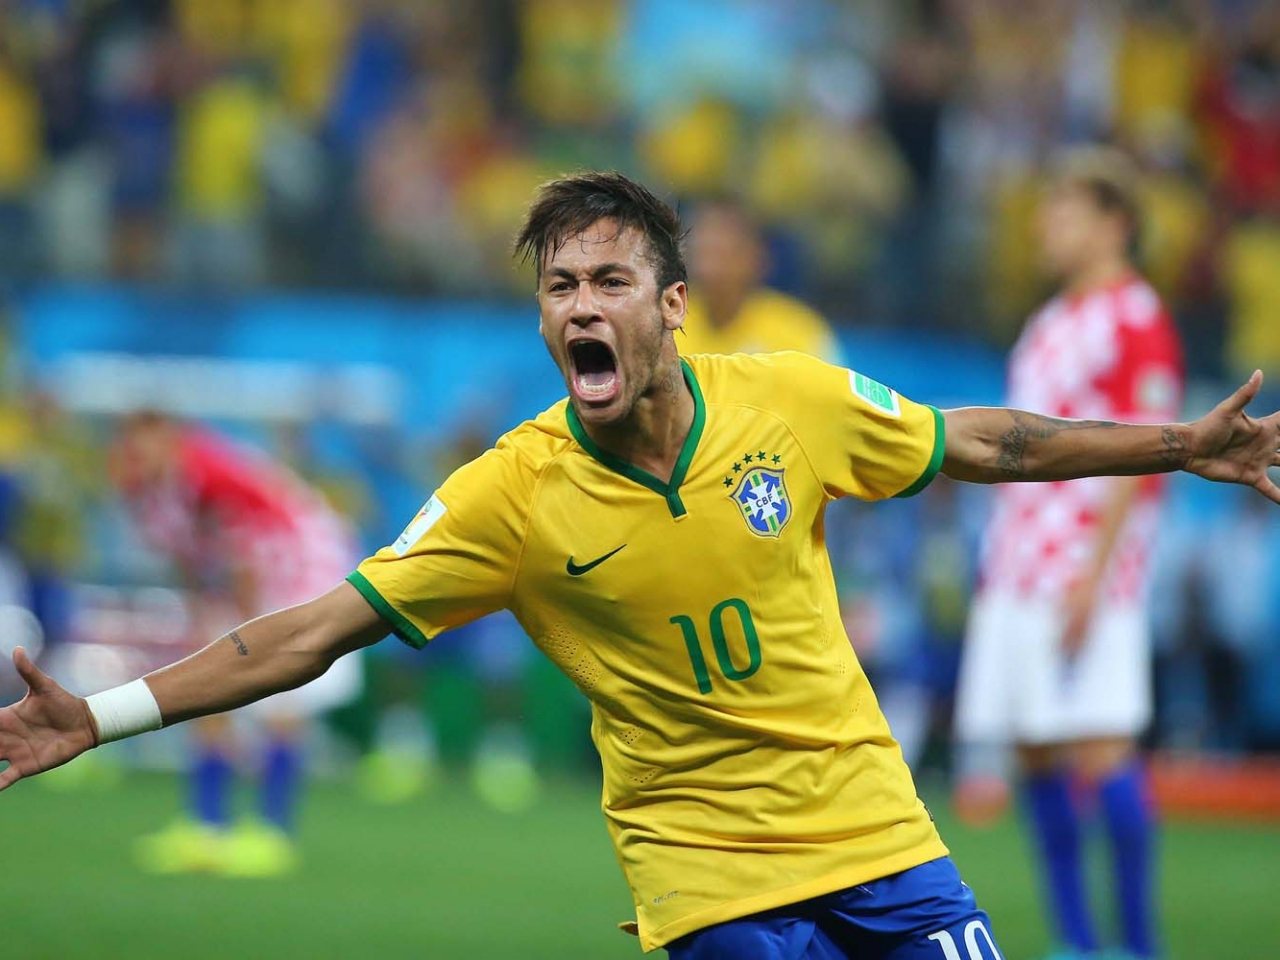 Neymar festejando gol - 1280x960